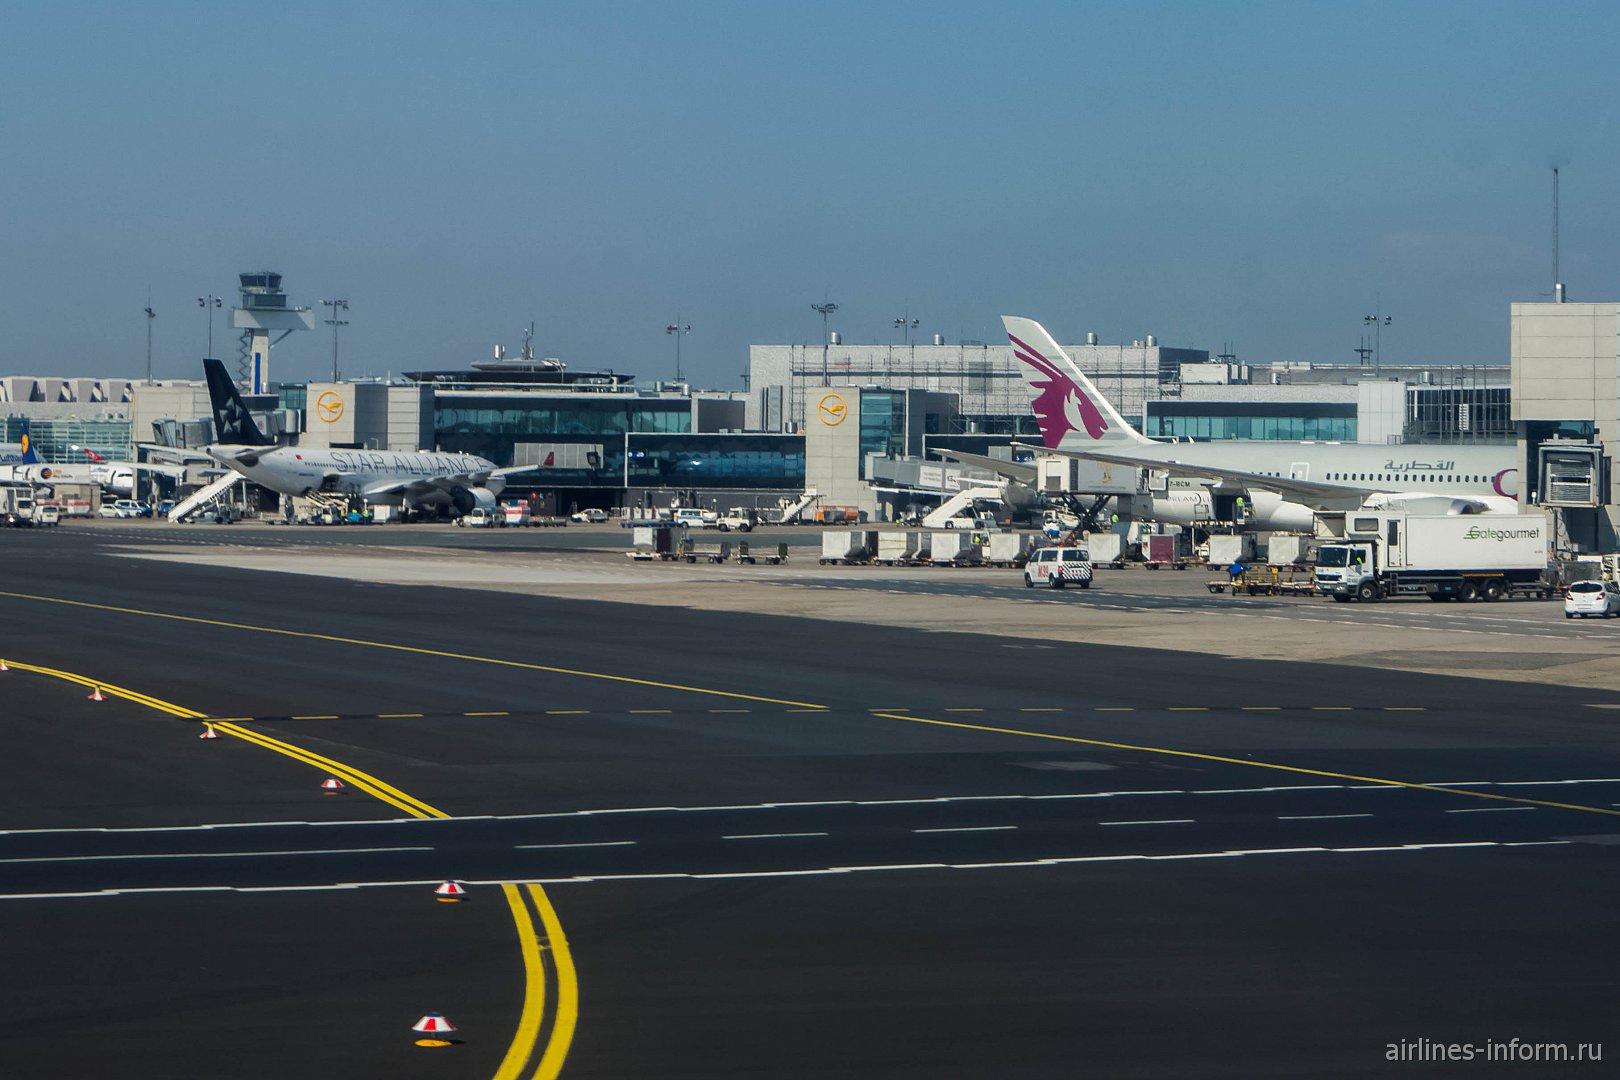 Терминал 1 аэропорта Франкфурт-на-Майне